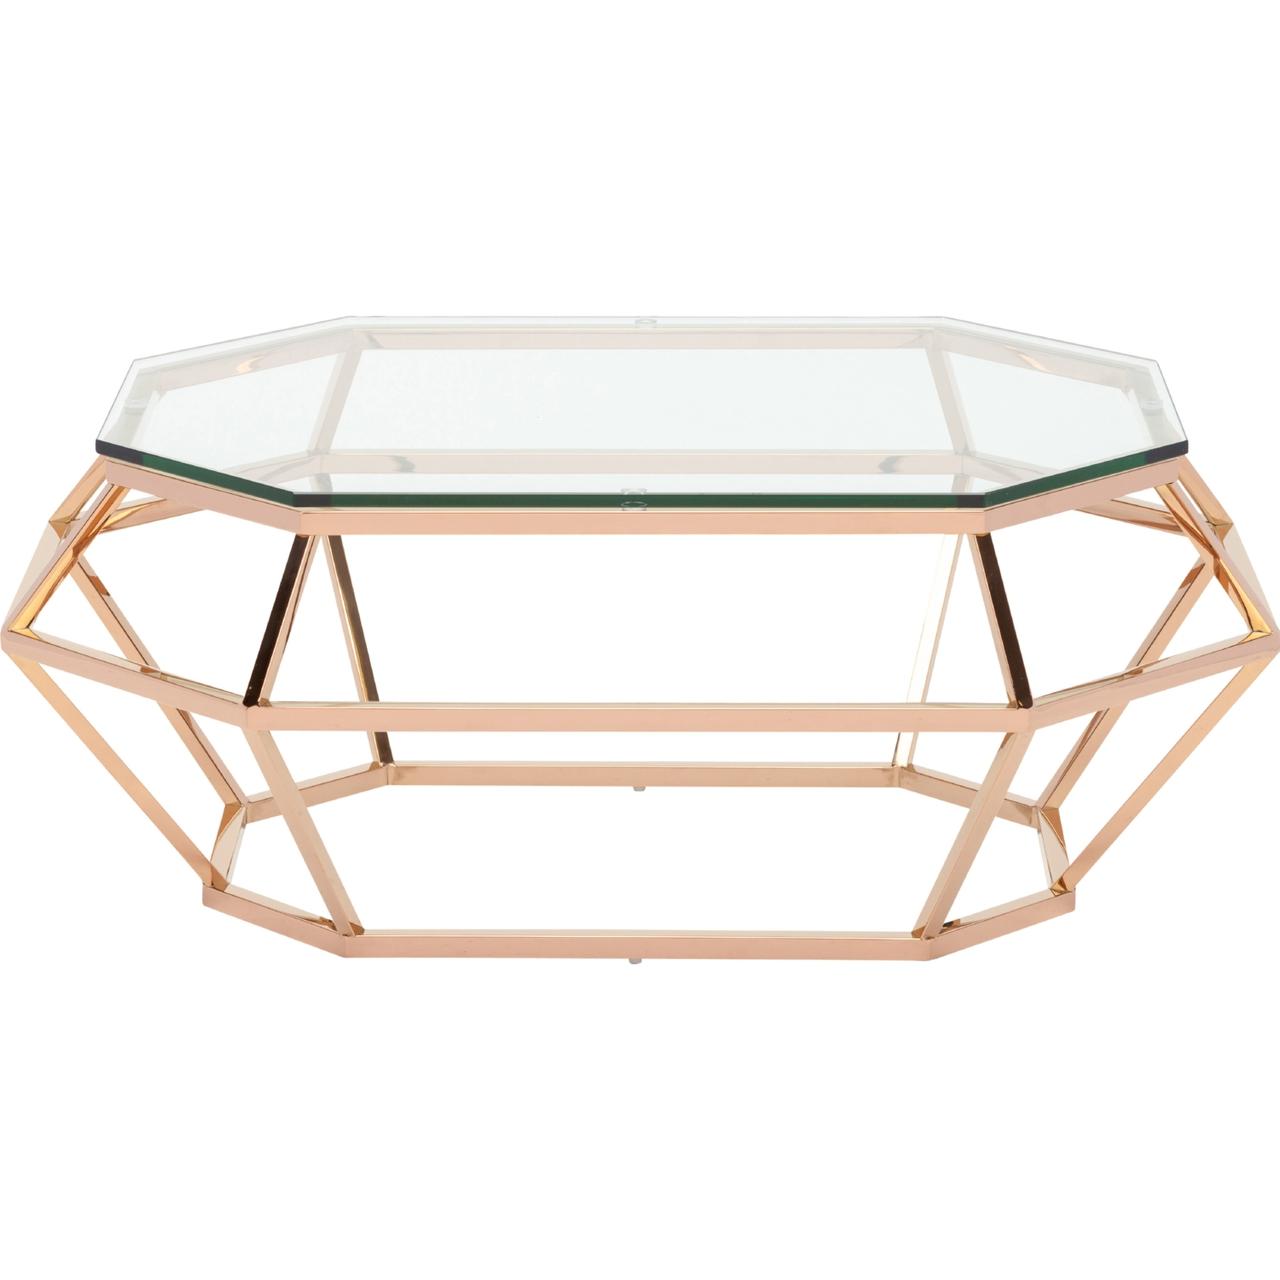 Diamond Rectangular Coffee Table By Nuevo Hgsx183 Home